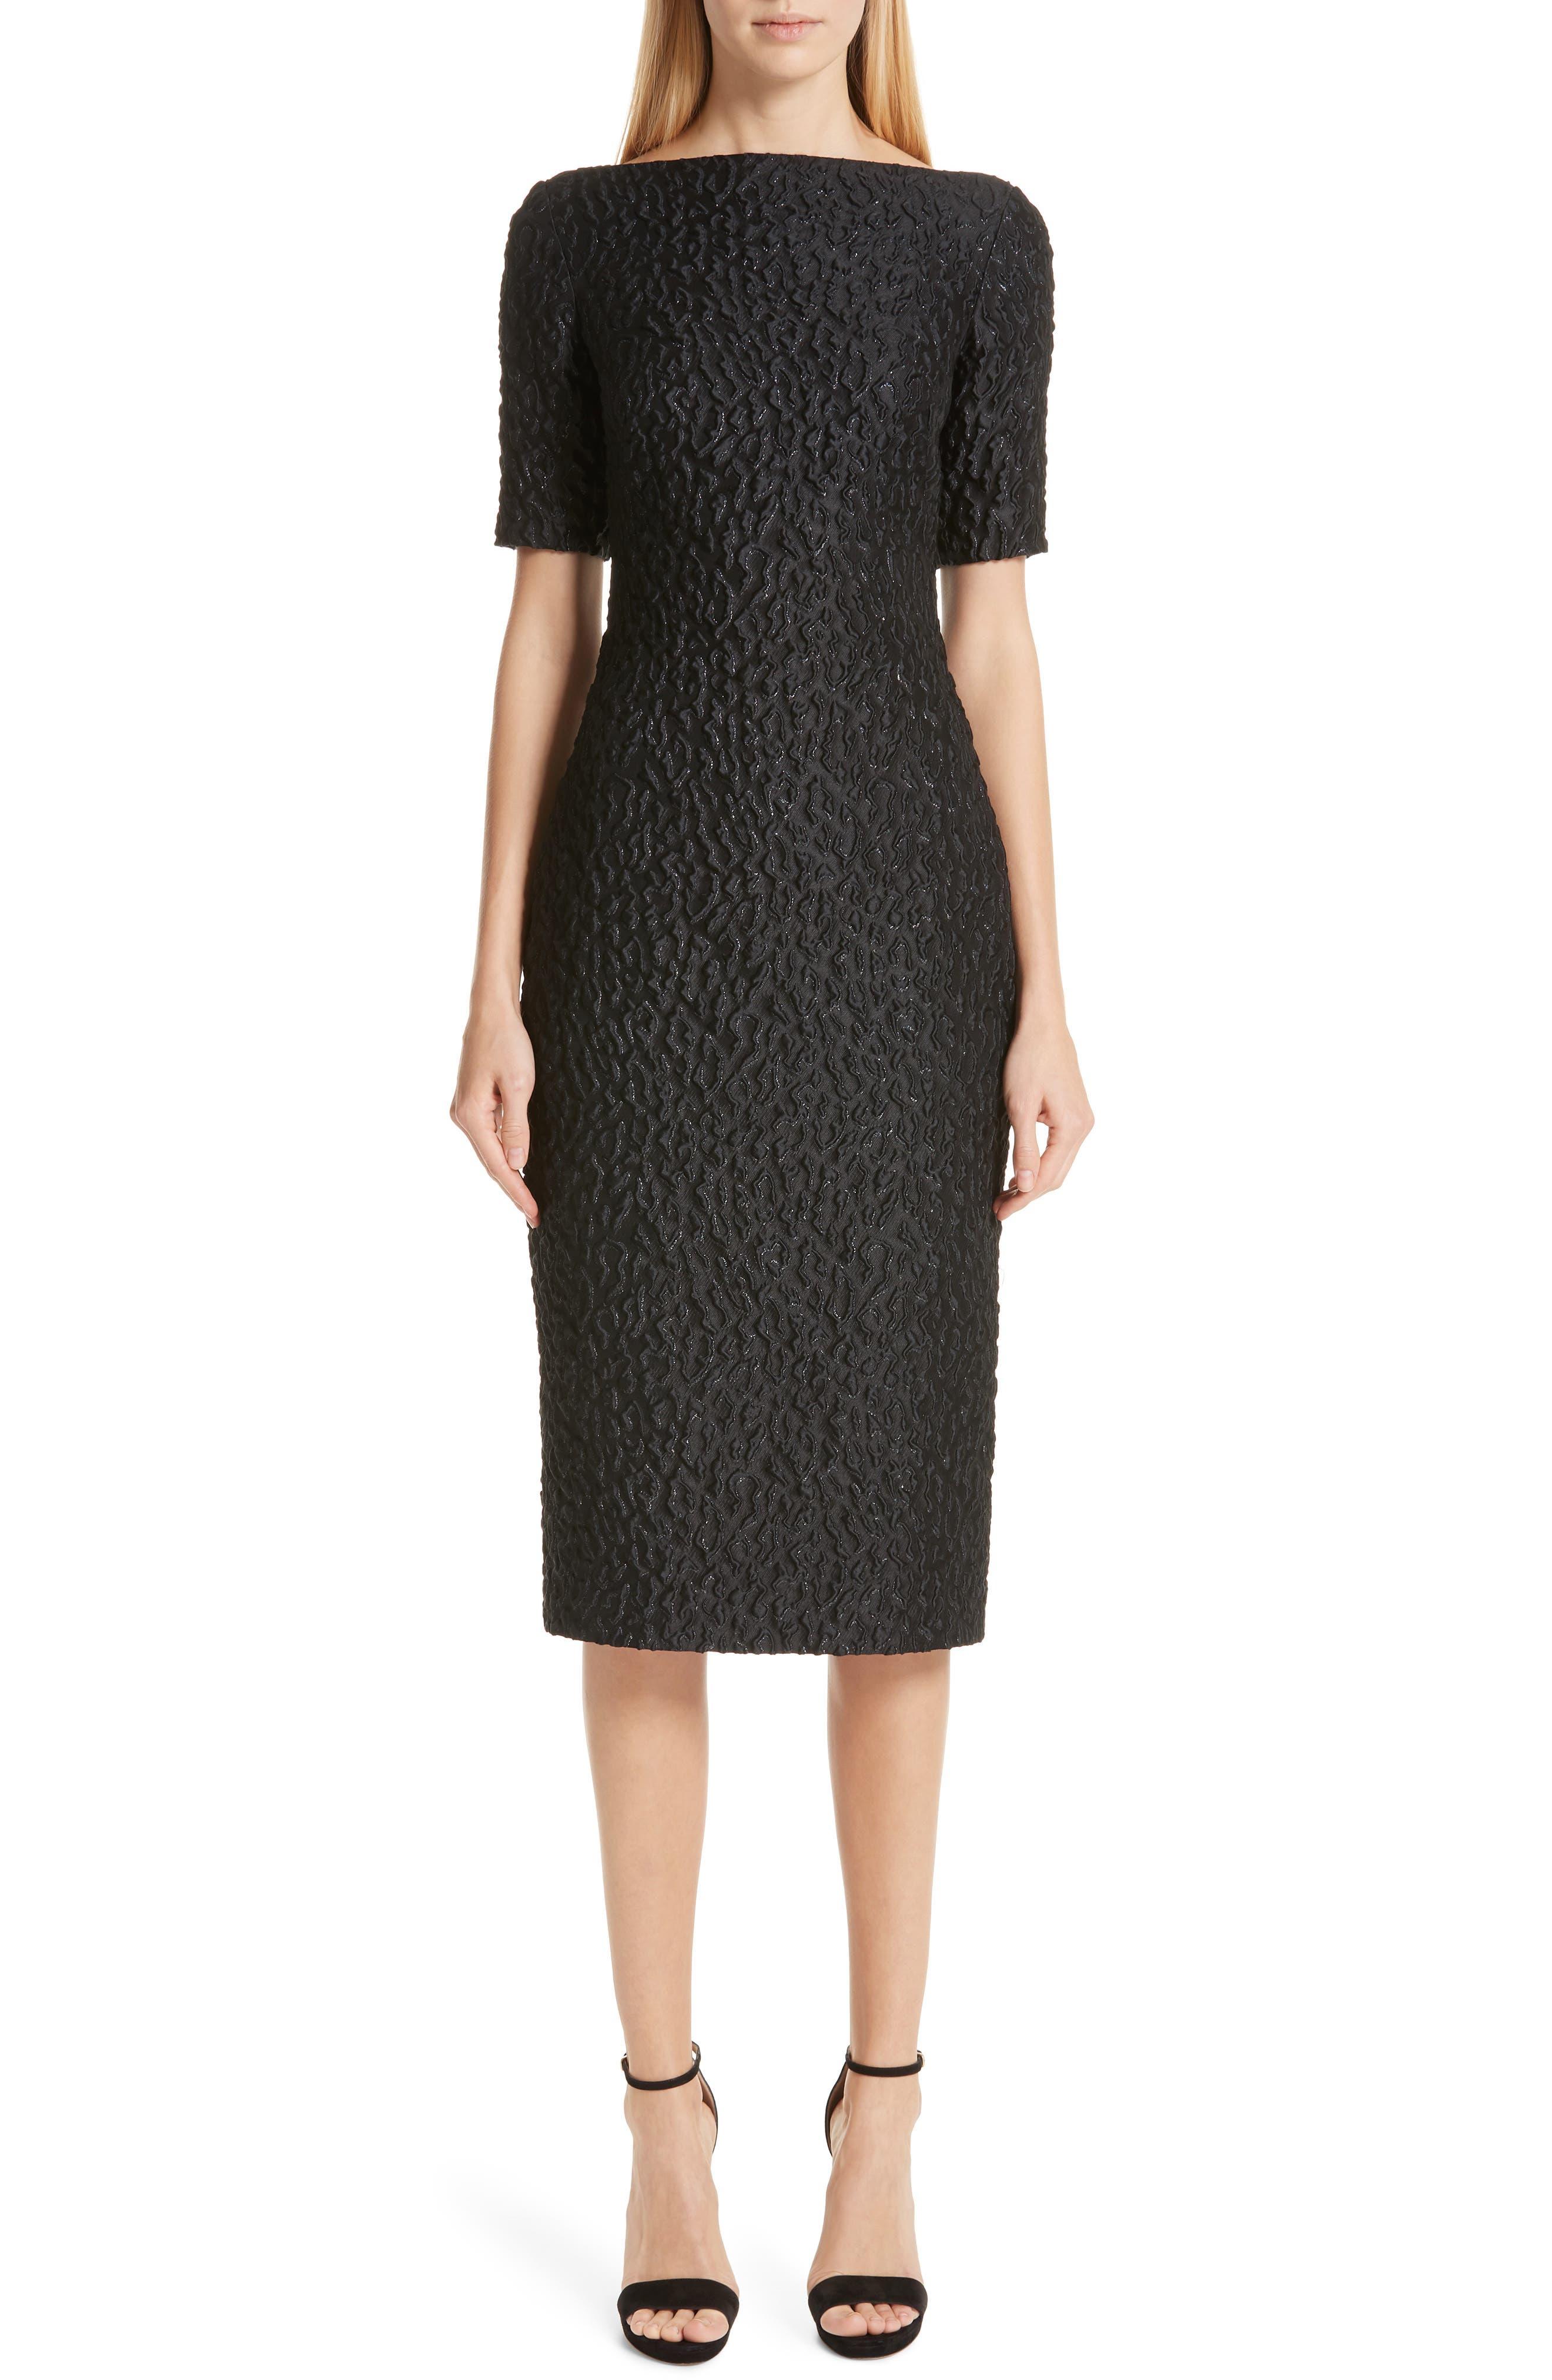 BRANDON MAXWELL, Leopard Jacquard Sheath Dress, Main thumbnail 1, color, BLACK